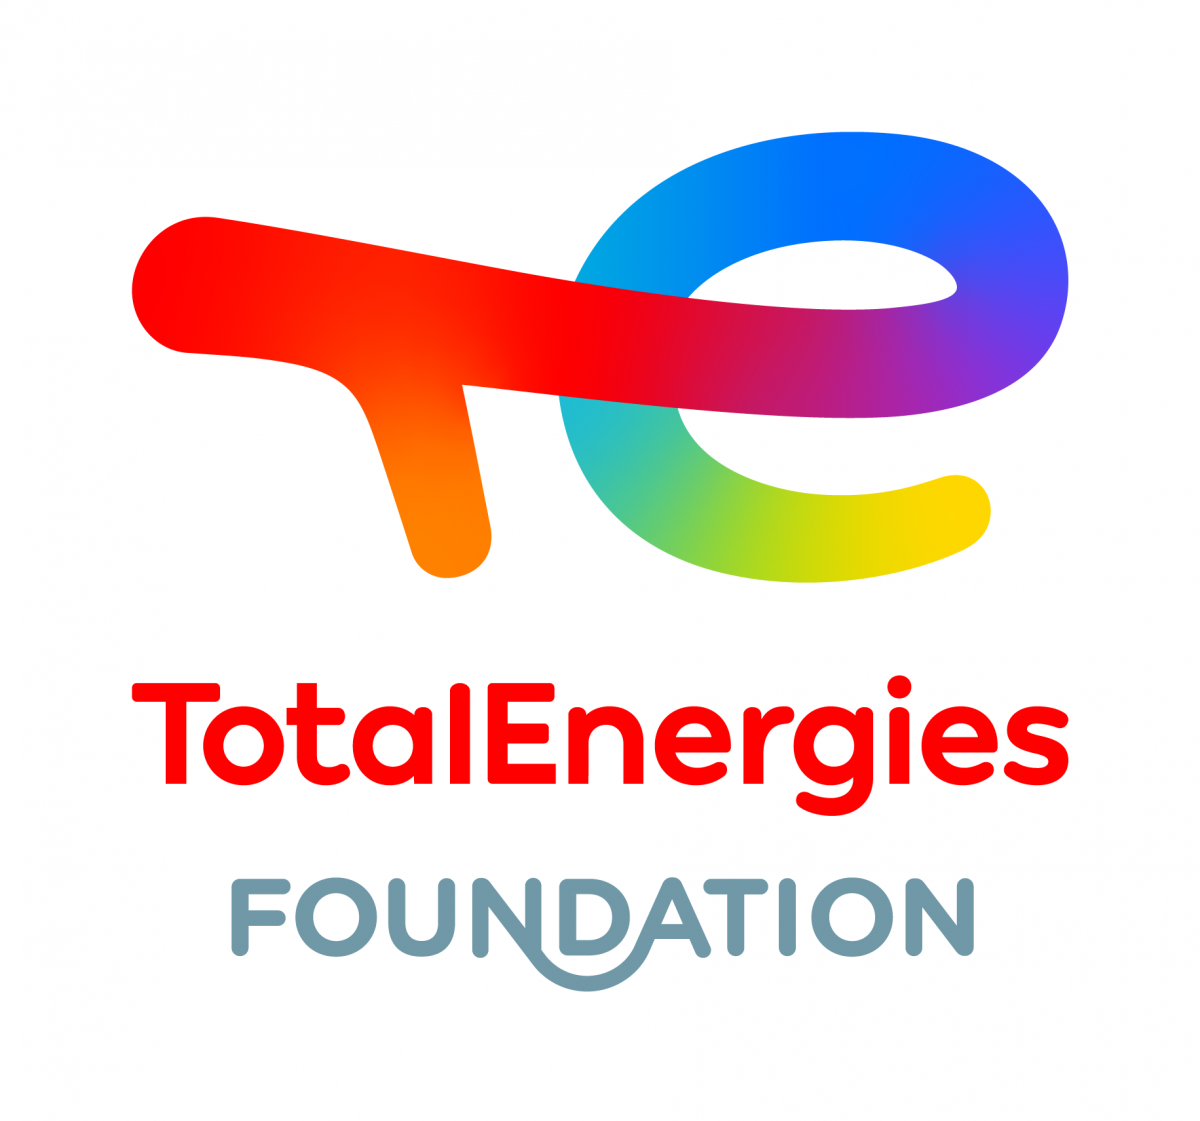 TotalEnergies_Foundation_Logo_RGB